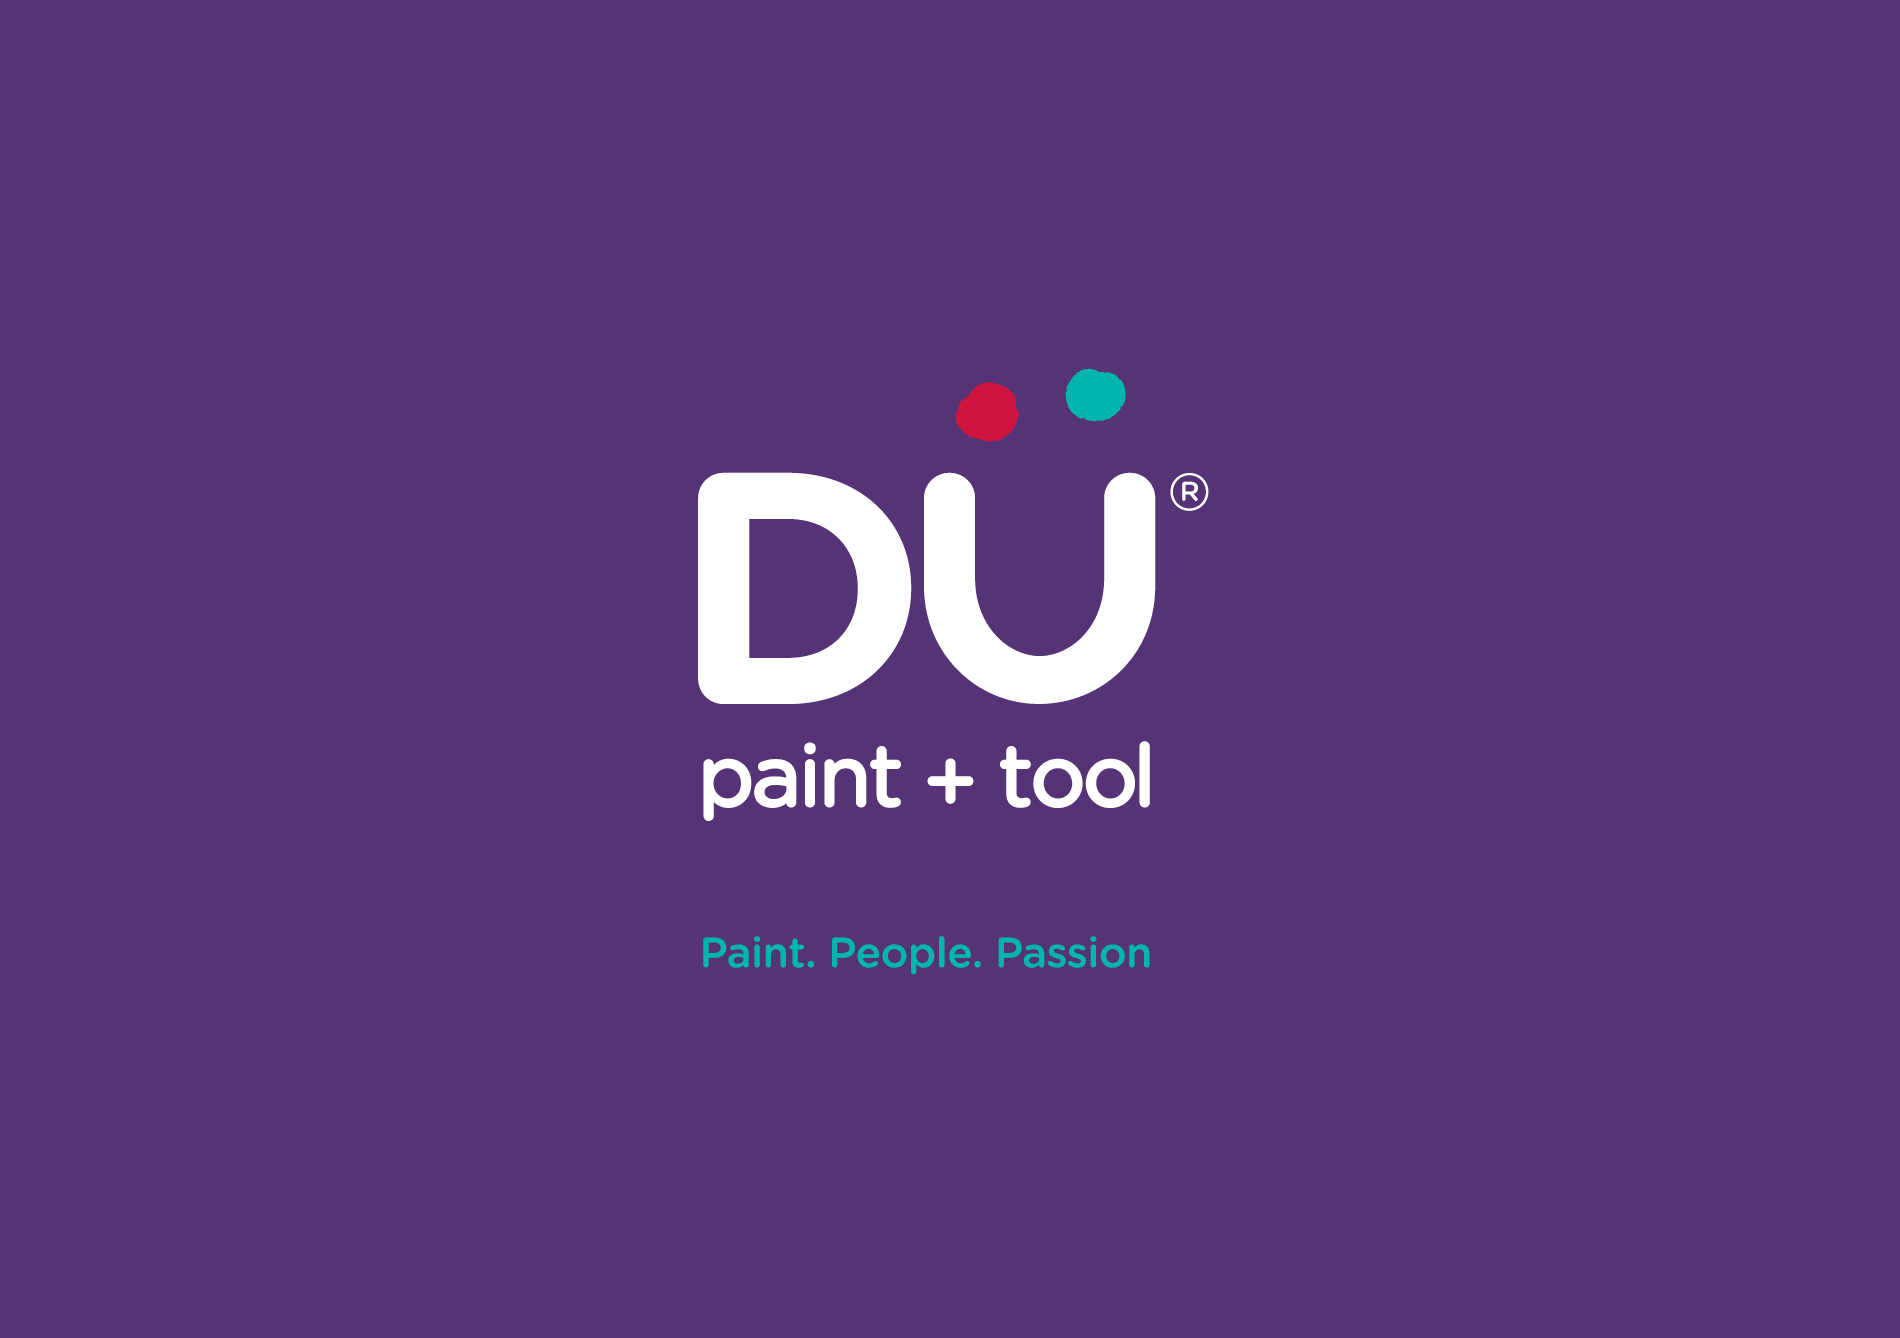 Graphic Design - client Dü Paint + Tool logo with registration mark